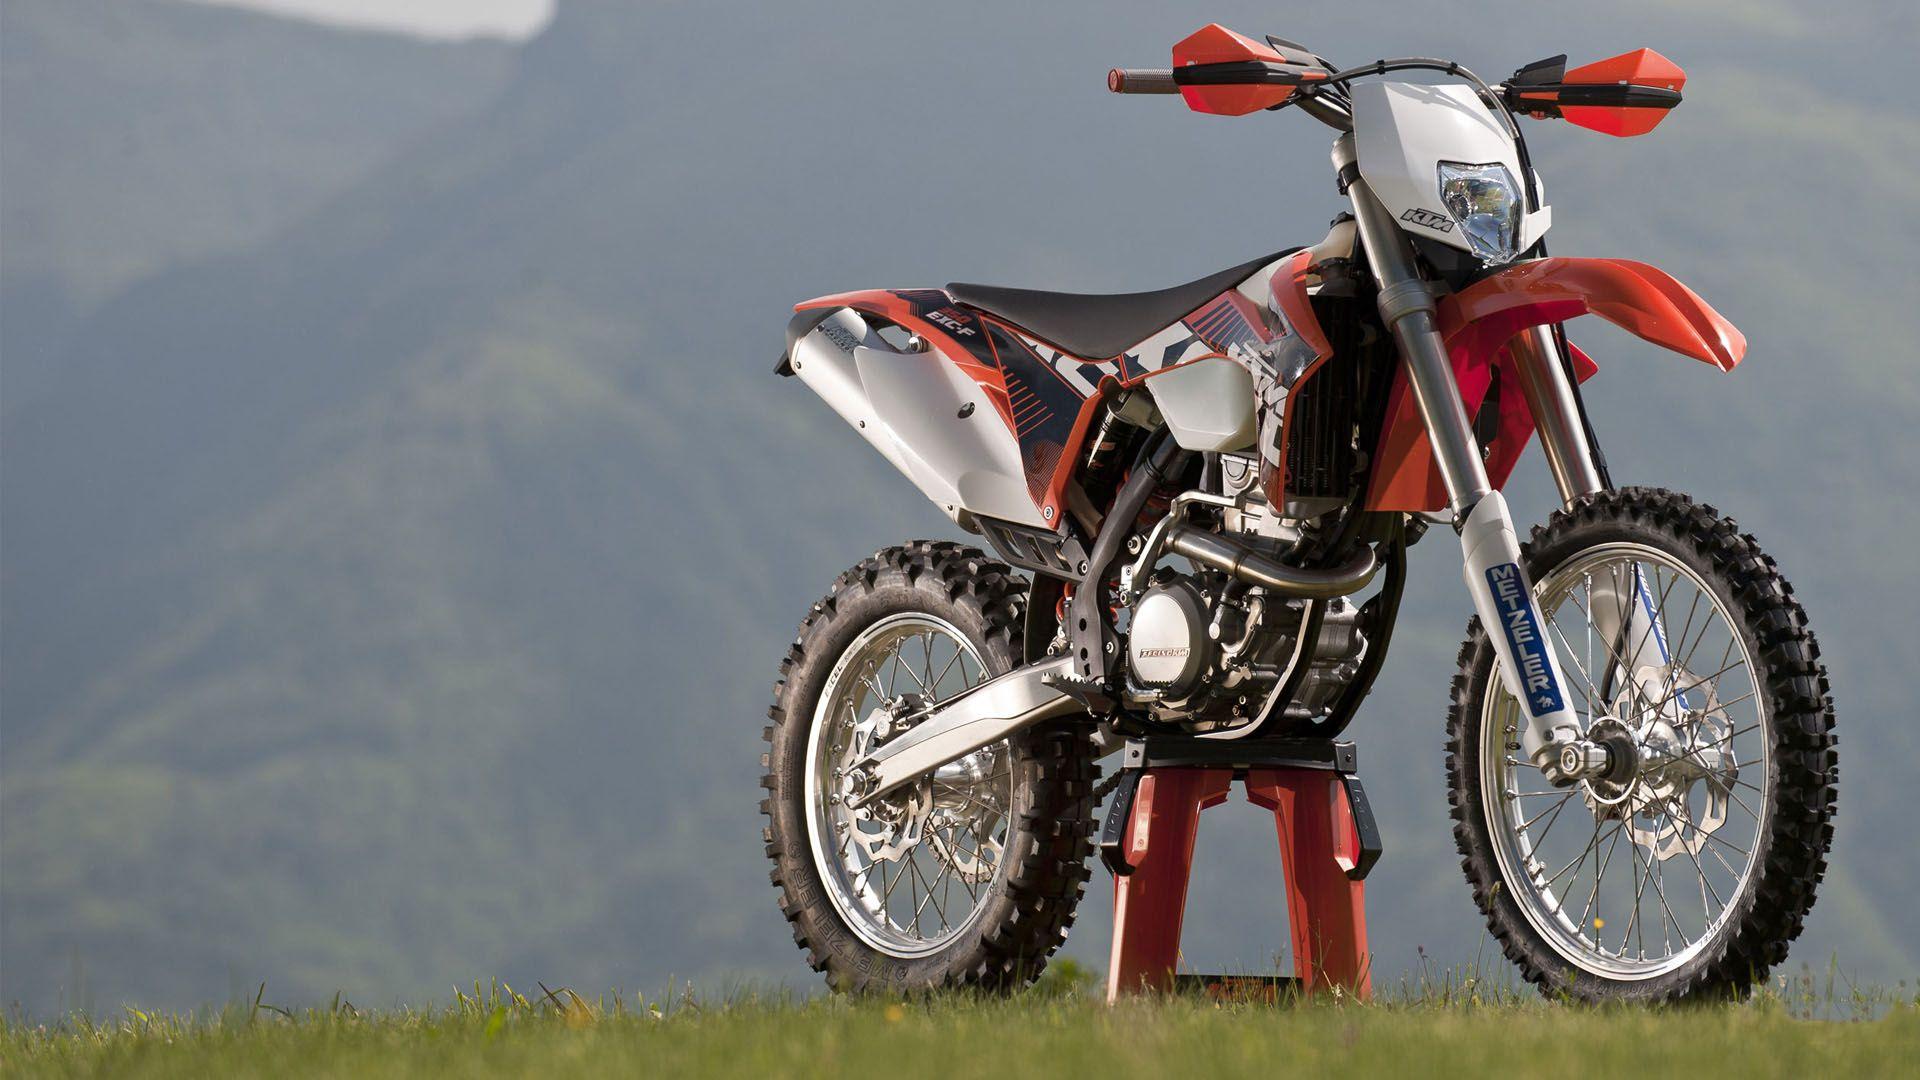 KTM 350 EXCF Bike Latest Wallpapers Download Ktm